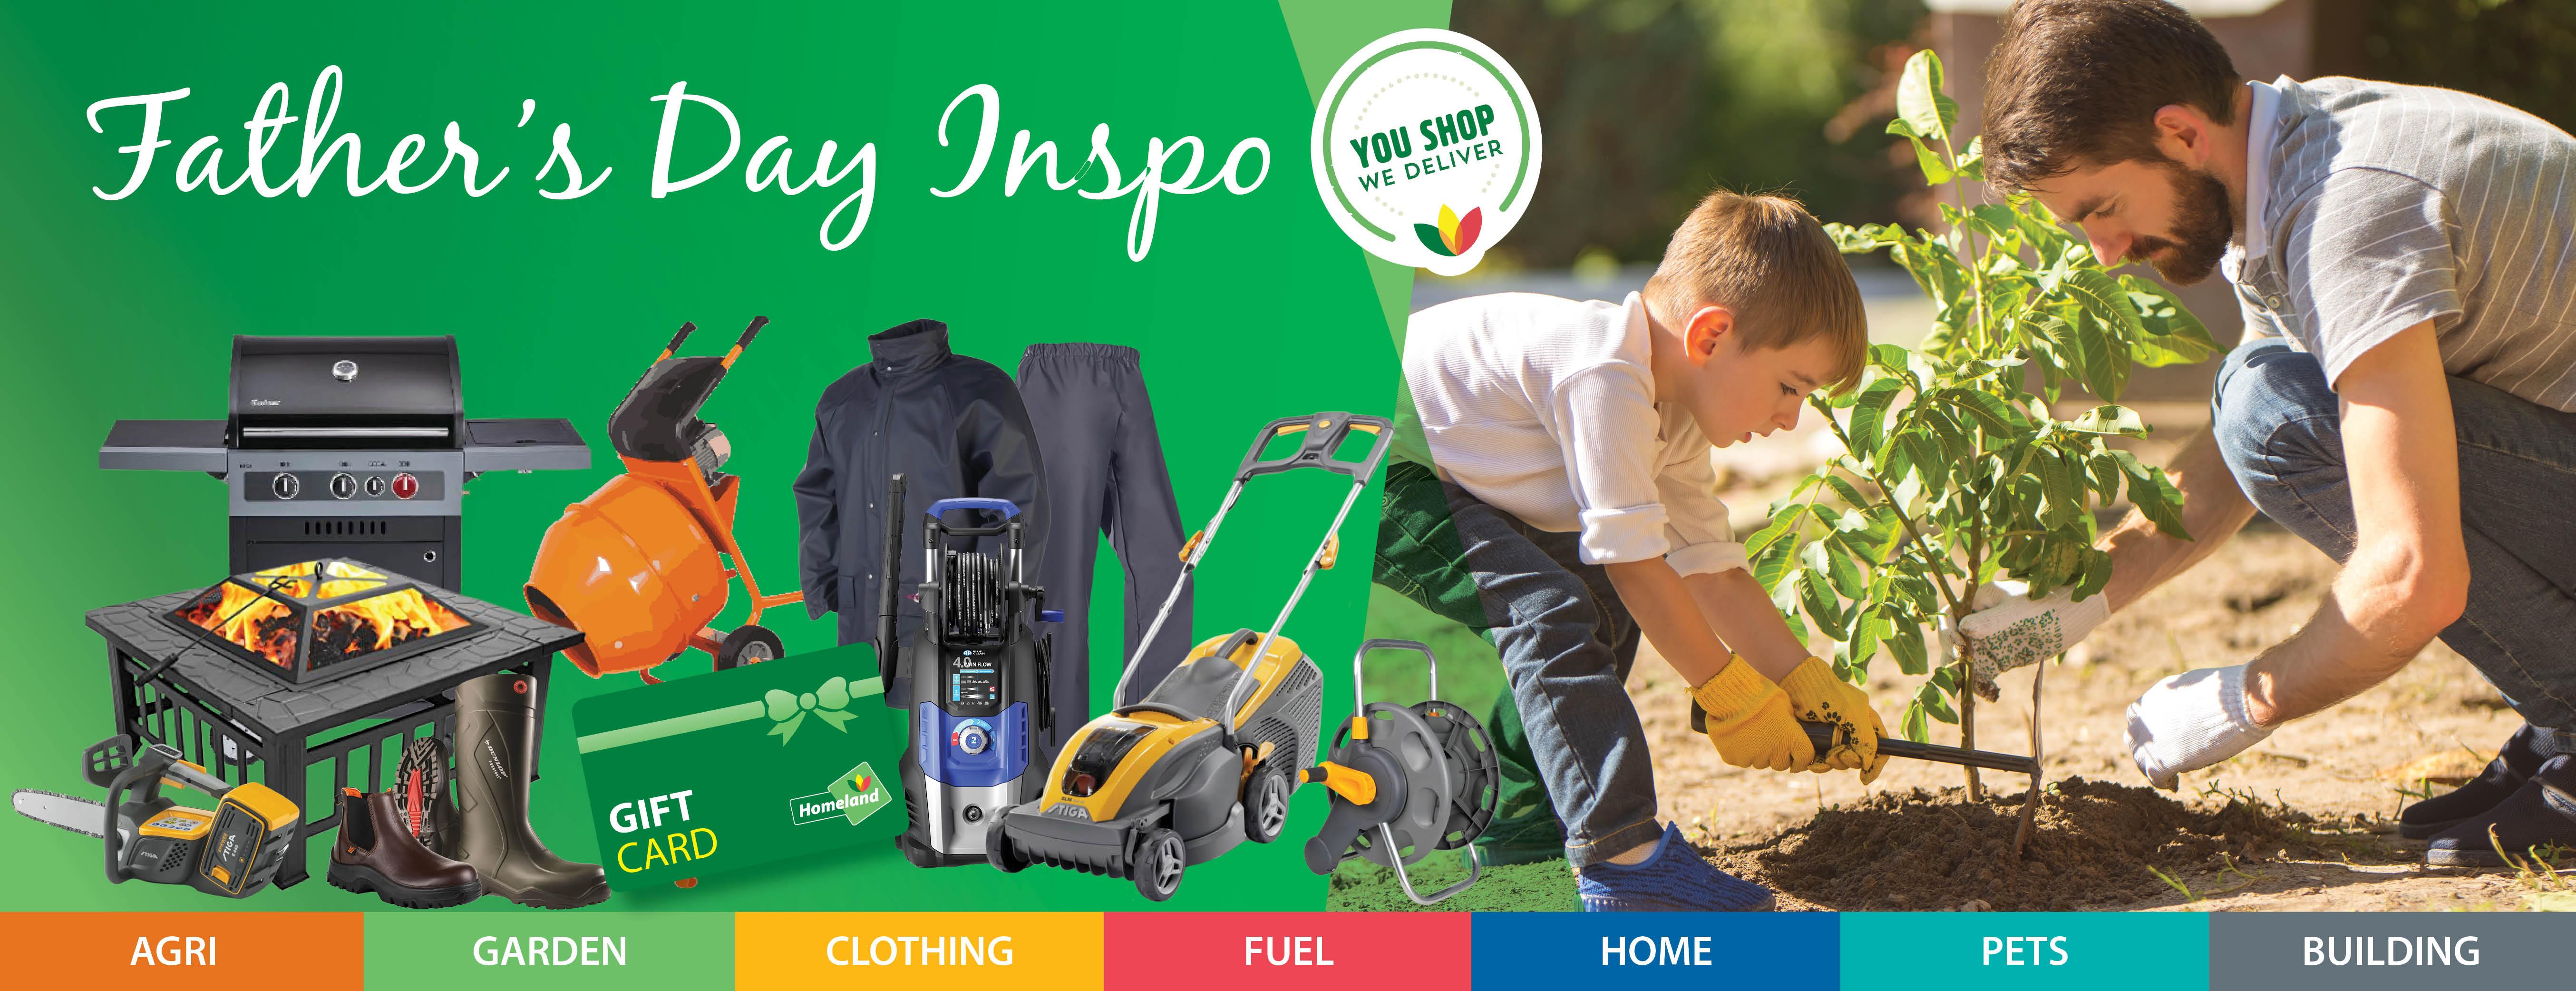 FD-Inspo_HP-BannerSoDIynUVG4oHO